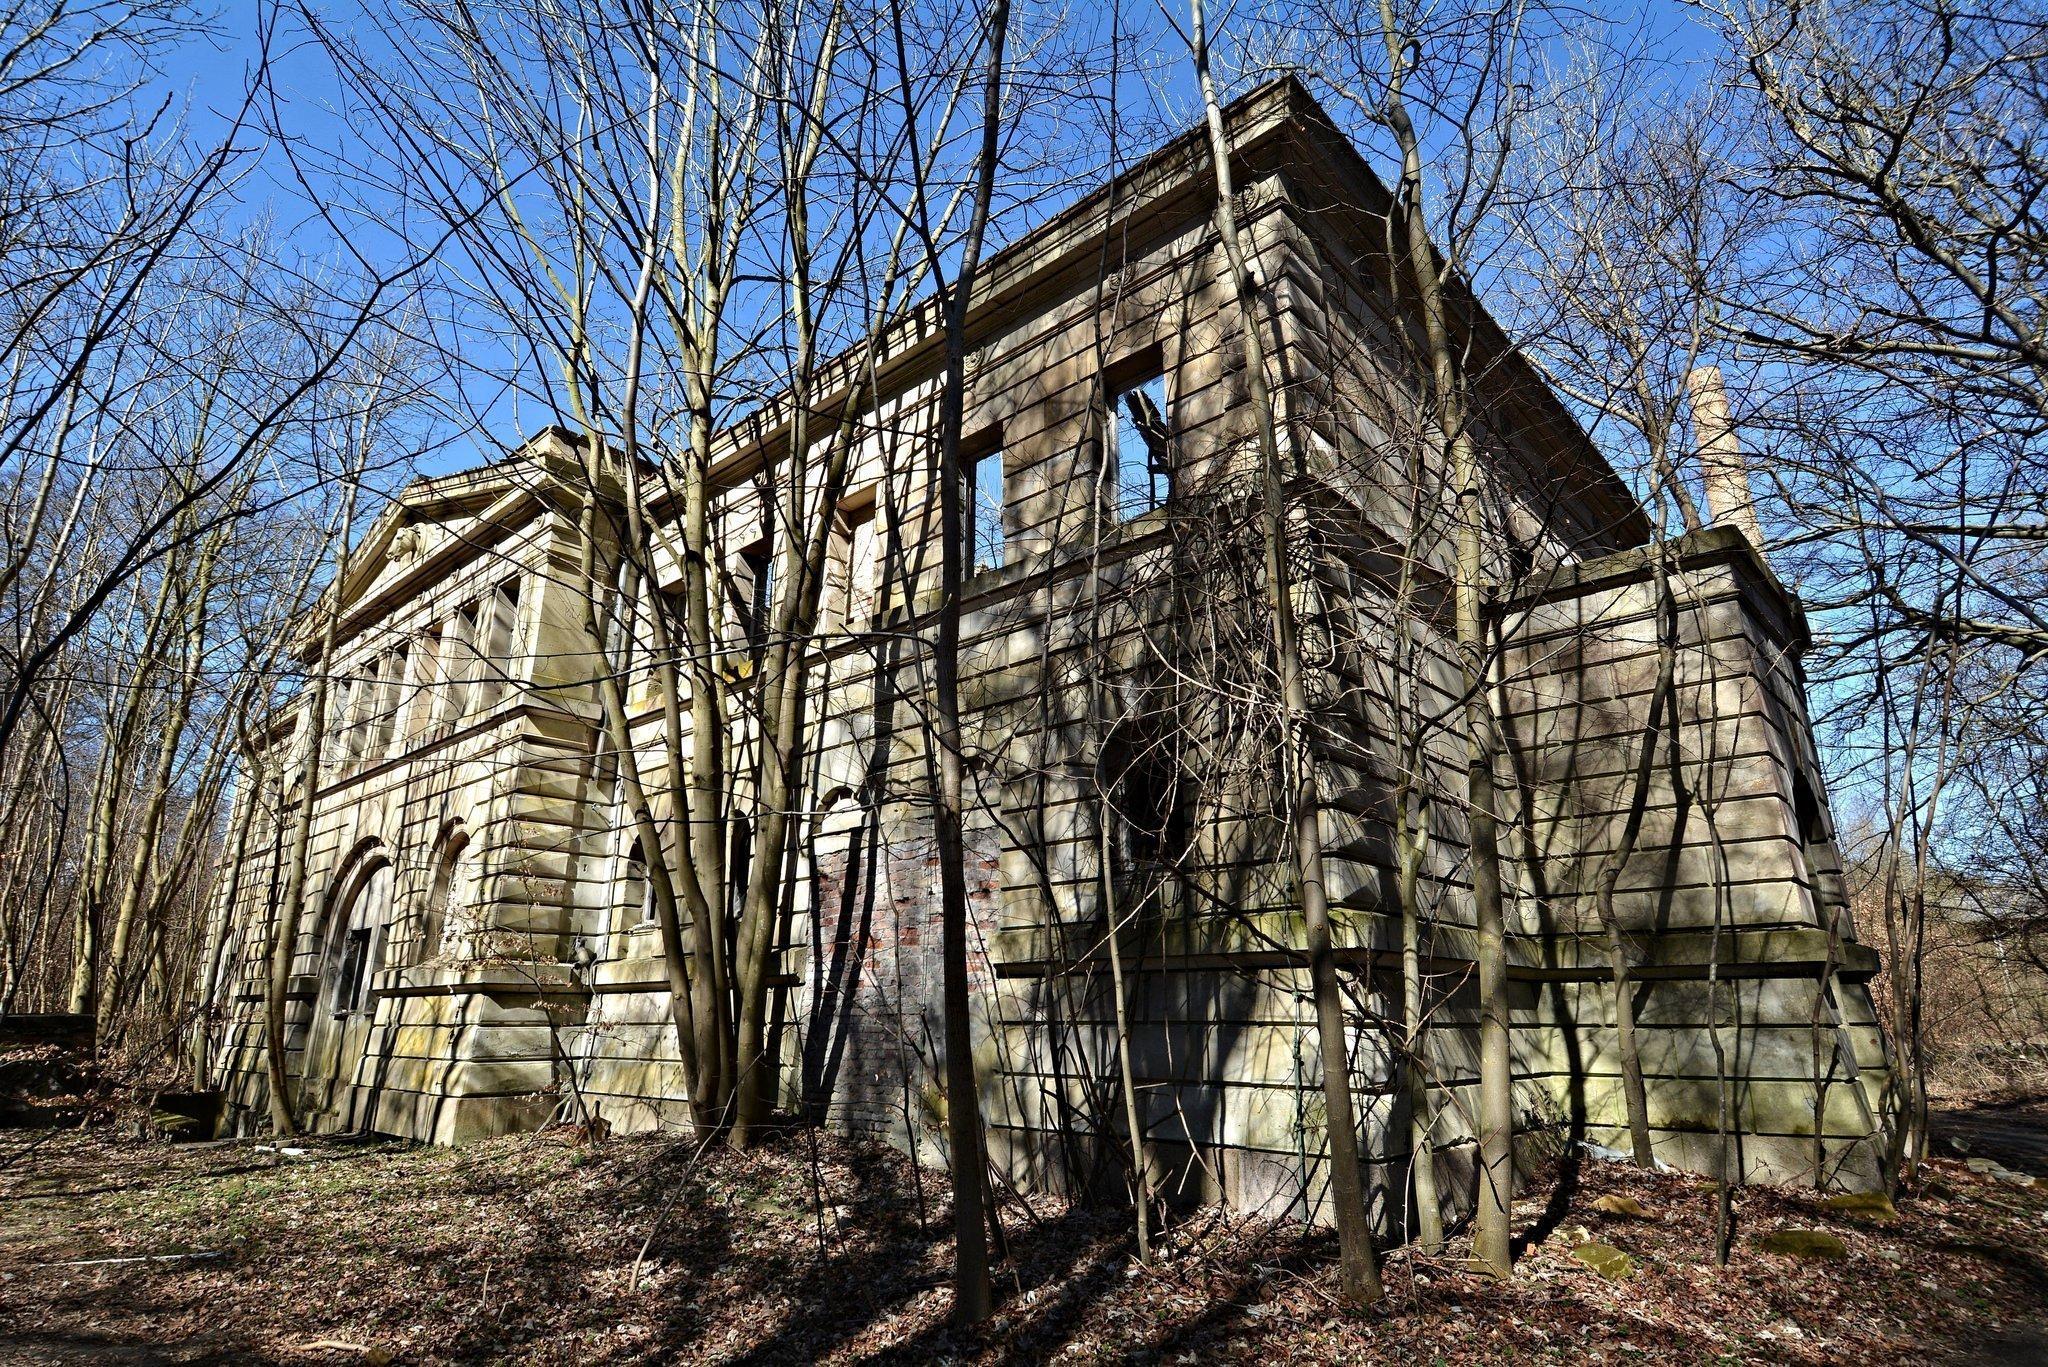 verlassene burg pferde stall ruinen abandoned castle horse stable germany urbex lost places ruins deutschland